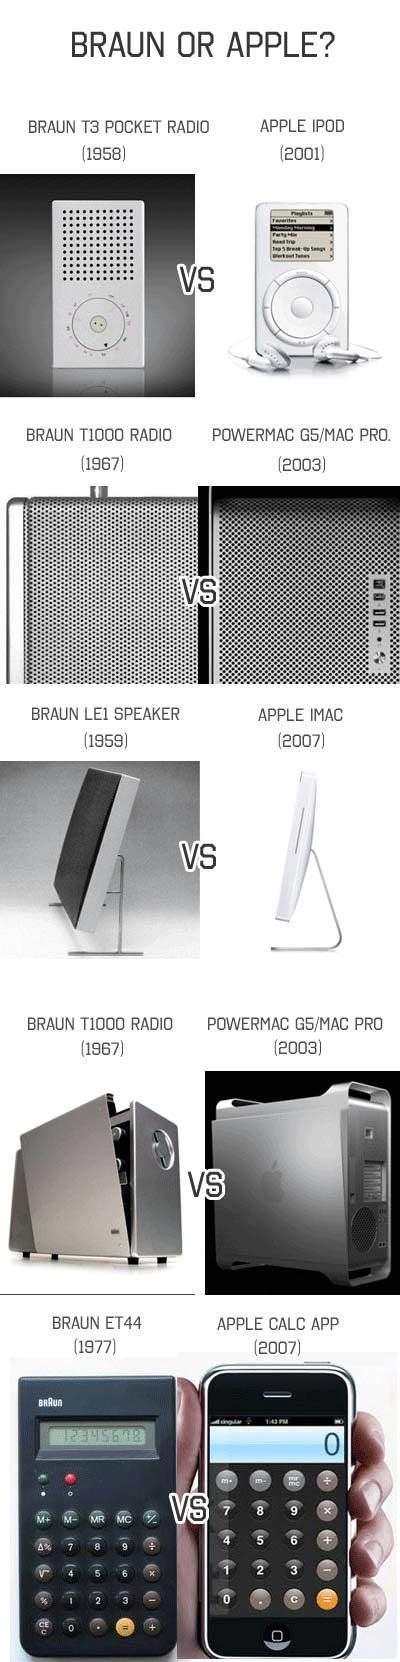 apple vs. braun